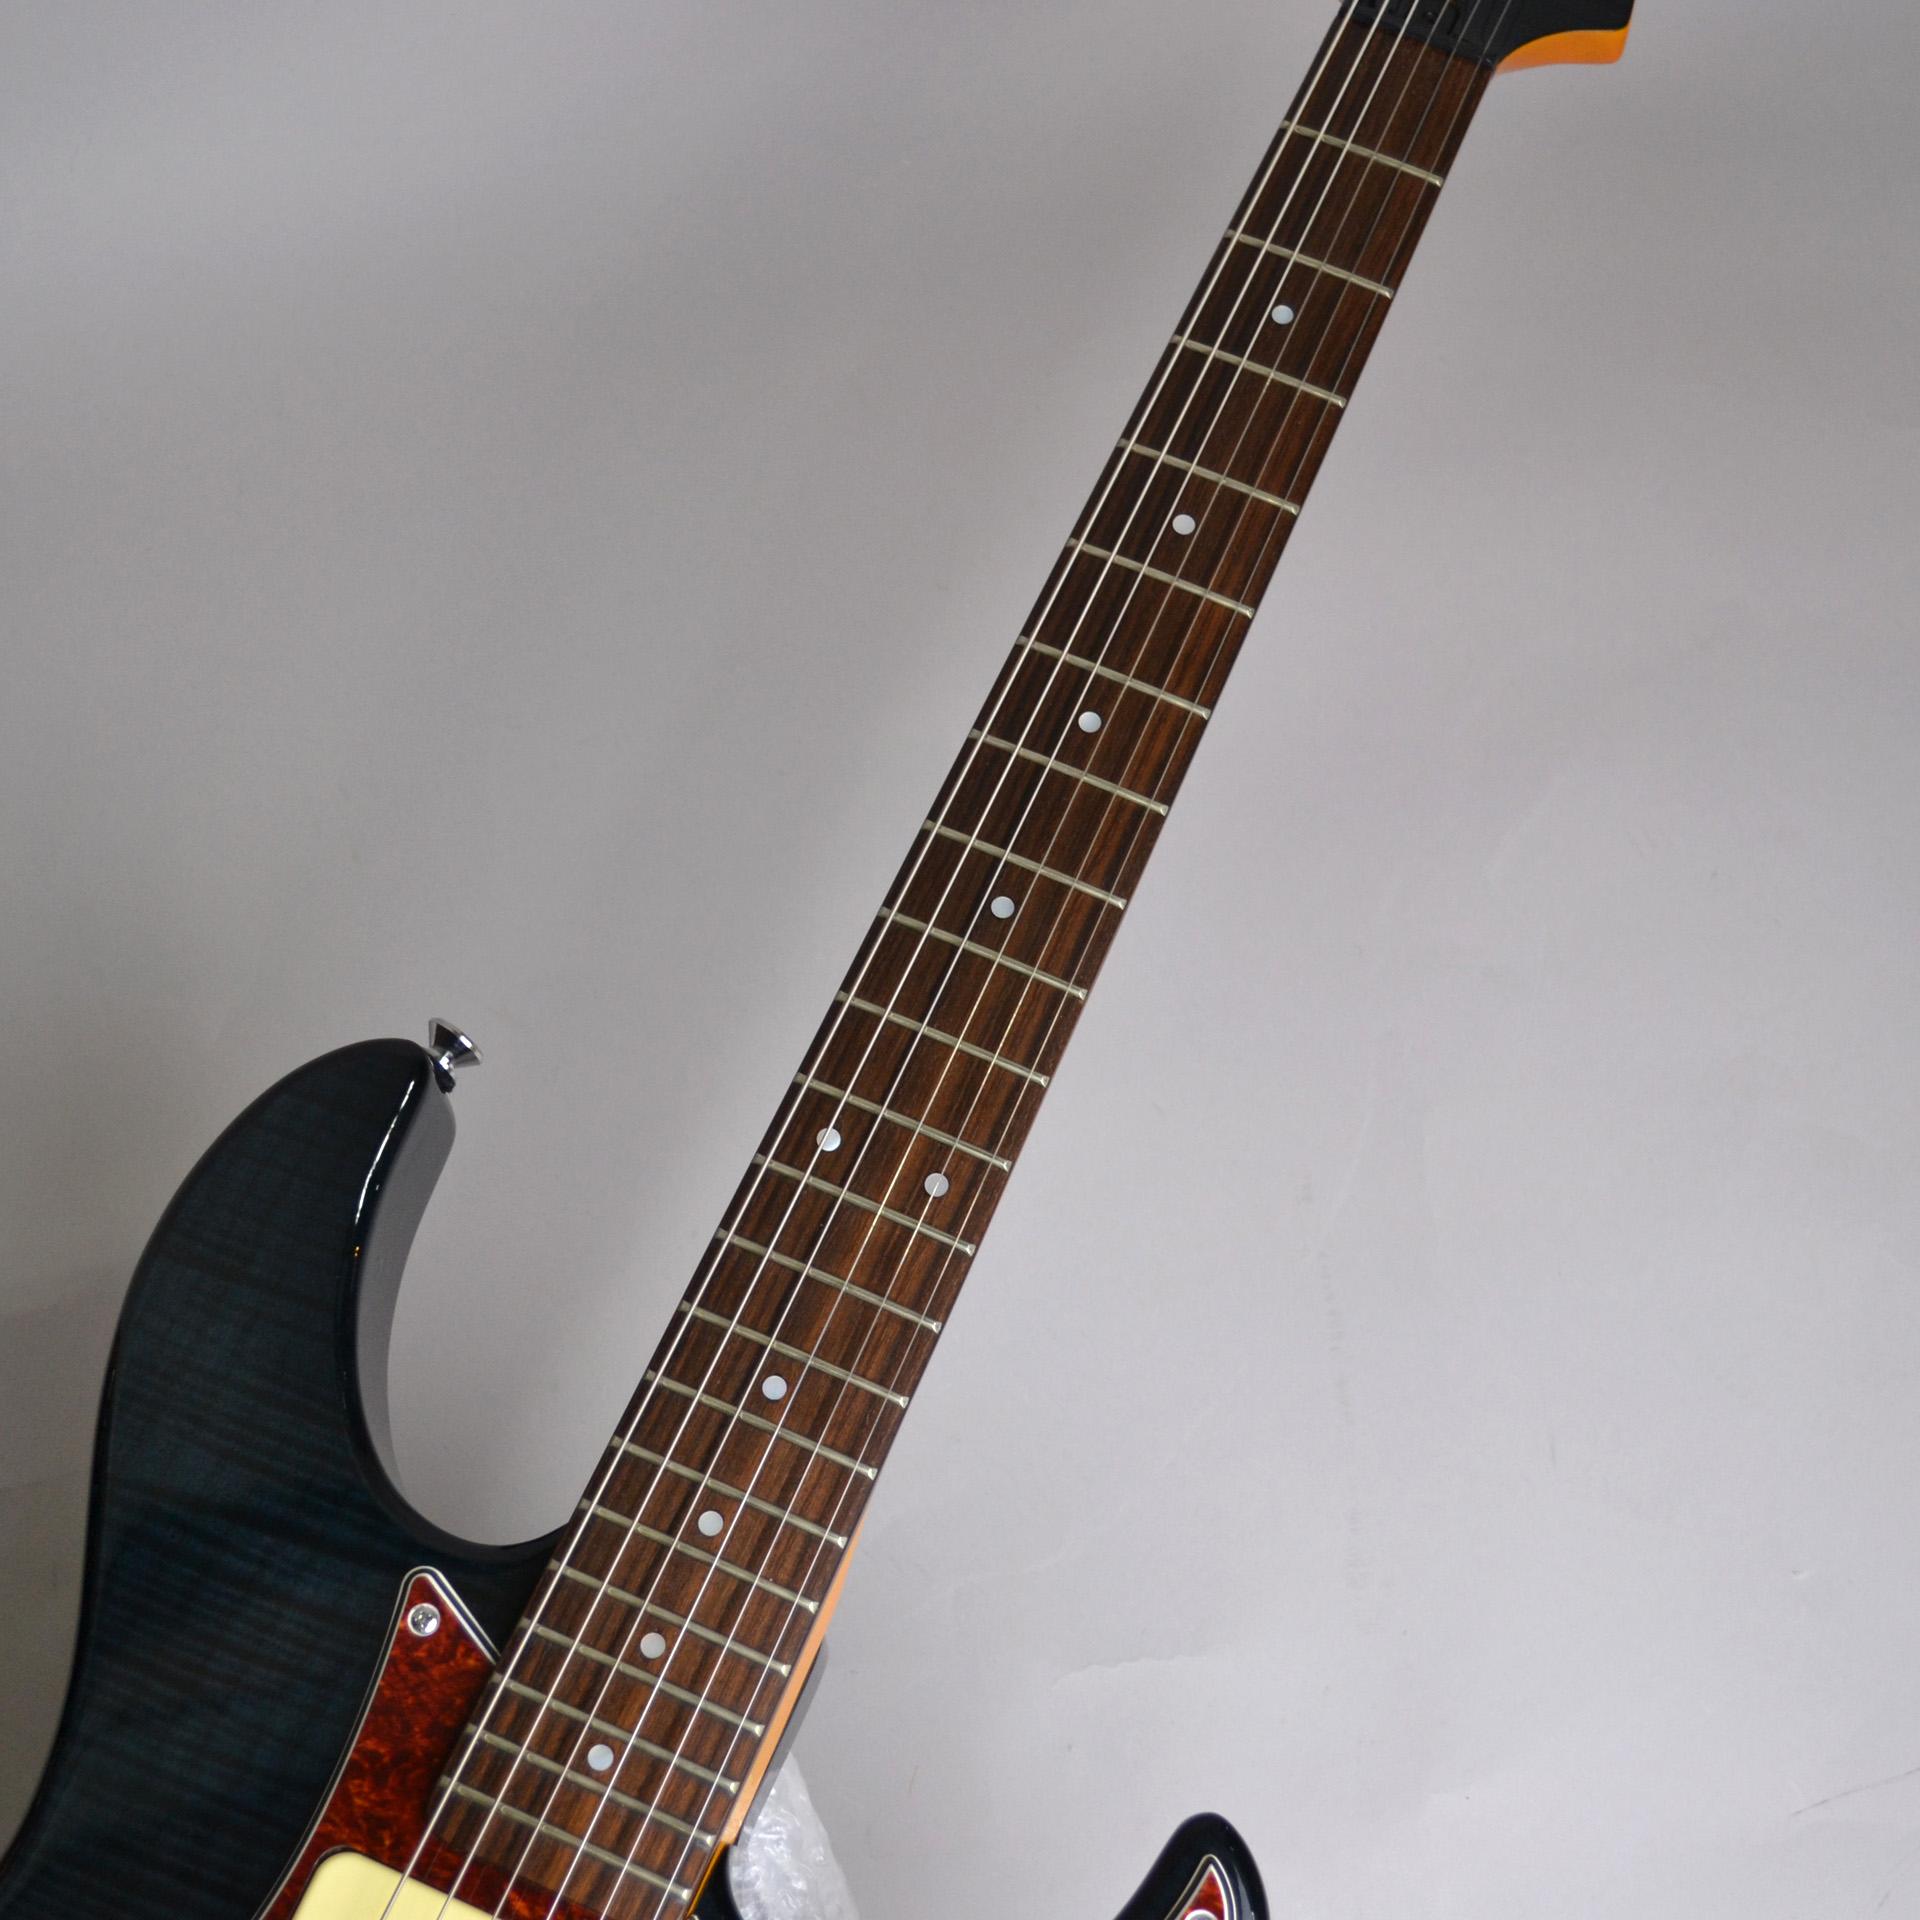 PAC611HFM Translucent Black 美品中古のボディバック-アップ画像